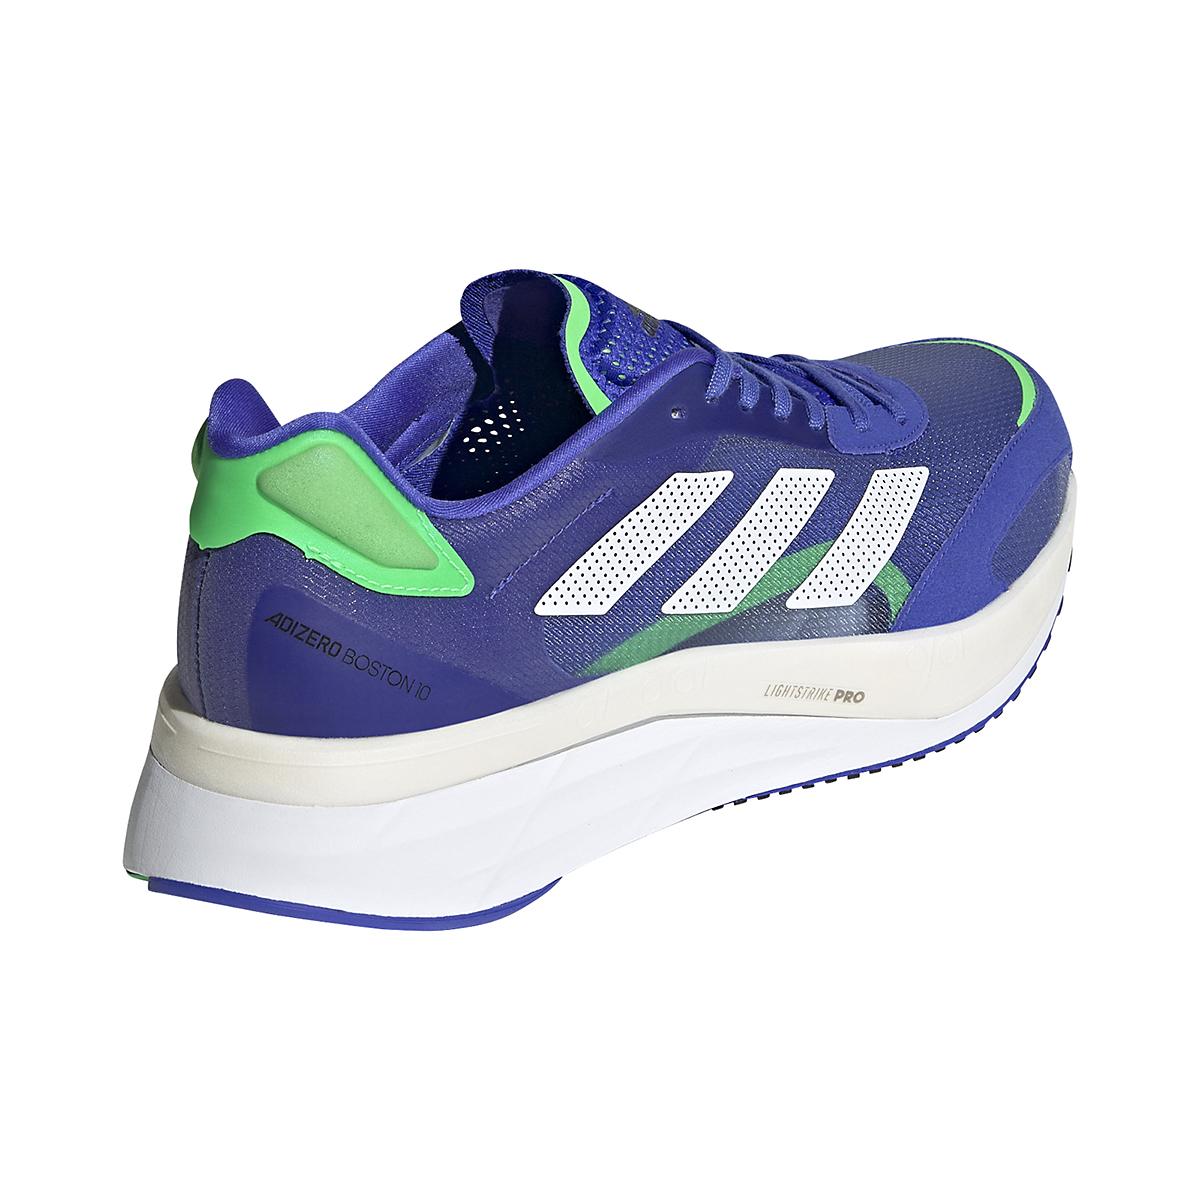 Men's Adidas Adizero Boston 10 Running Shoe - Color: Sonic Ink/White/Screaming Green - Size: 6.5 - Width: Regular, Sonic Ink/White/Screaming Green, large, image 6